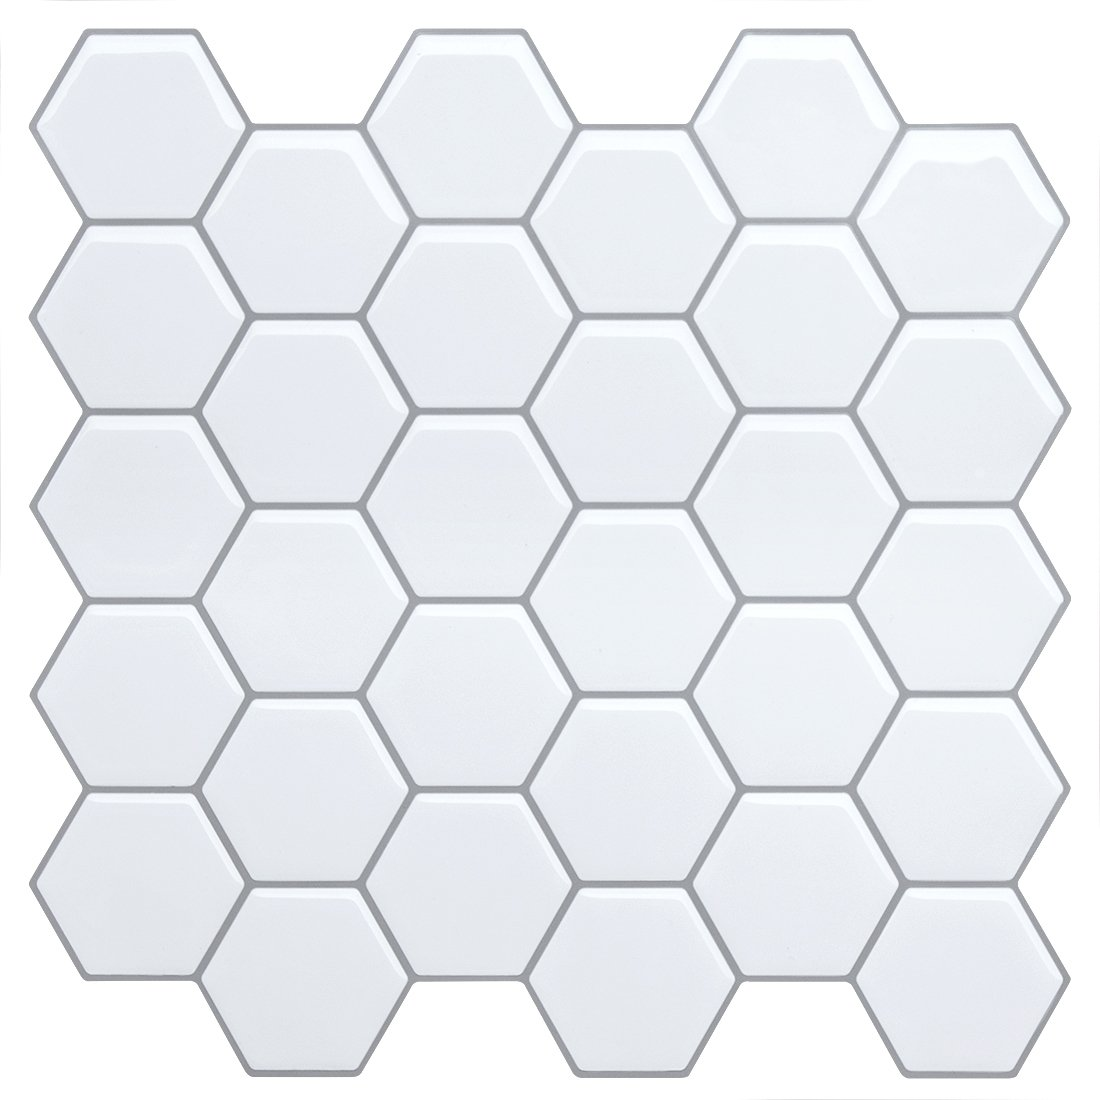 White Anti-Mold Peel and Stick Tile Backsplash -Marble Hexagon Tile for Kitchen Bathroom,Faux Ceramic Tile Design(4 Tiles)